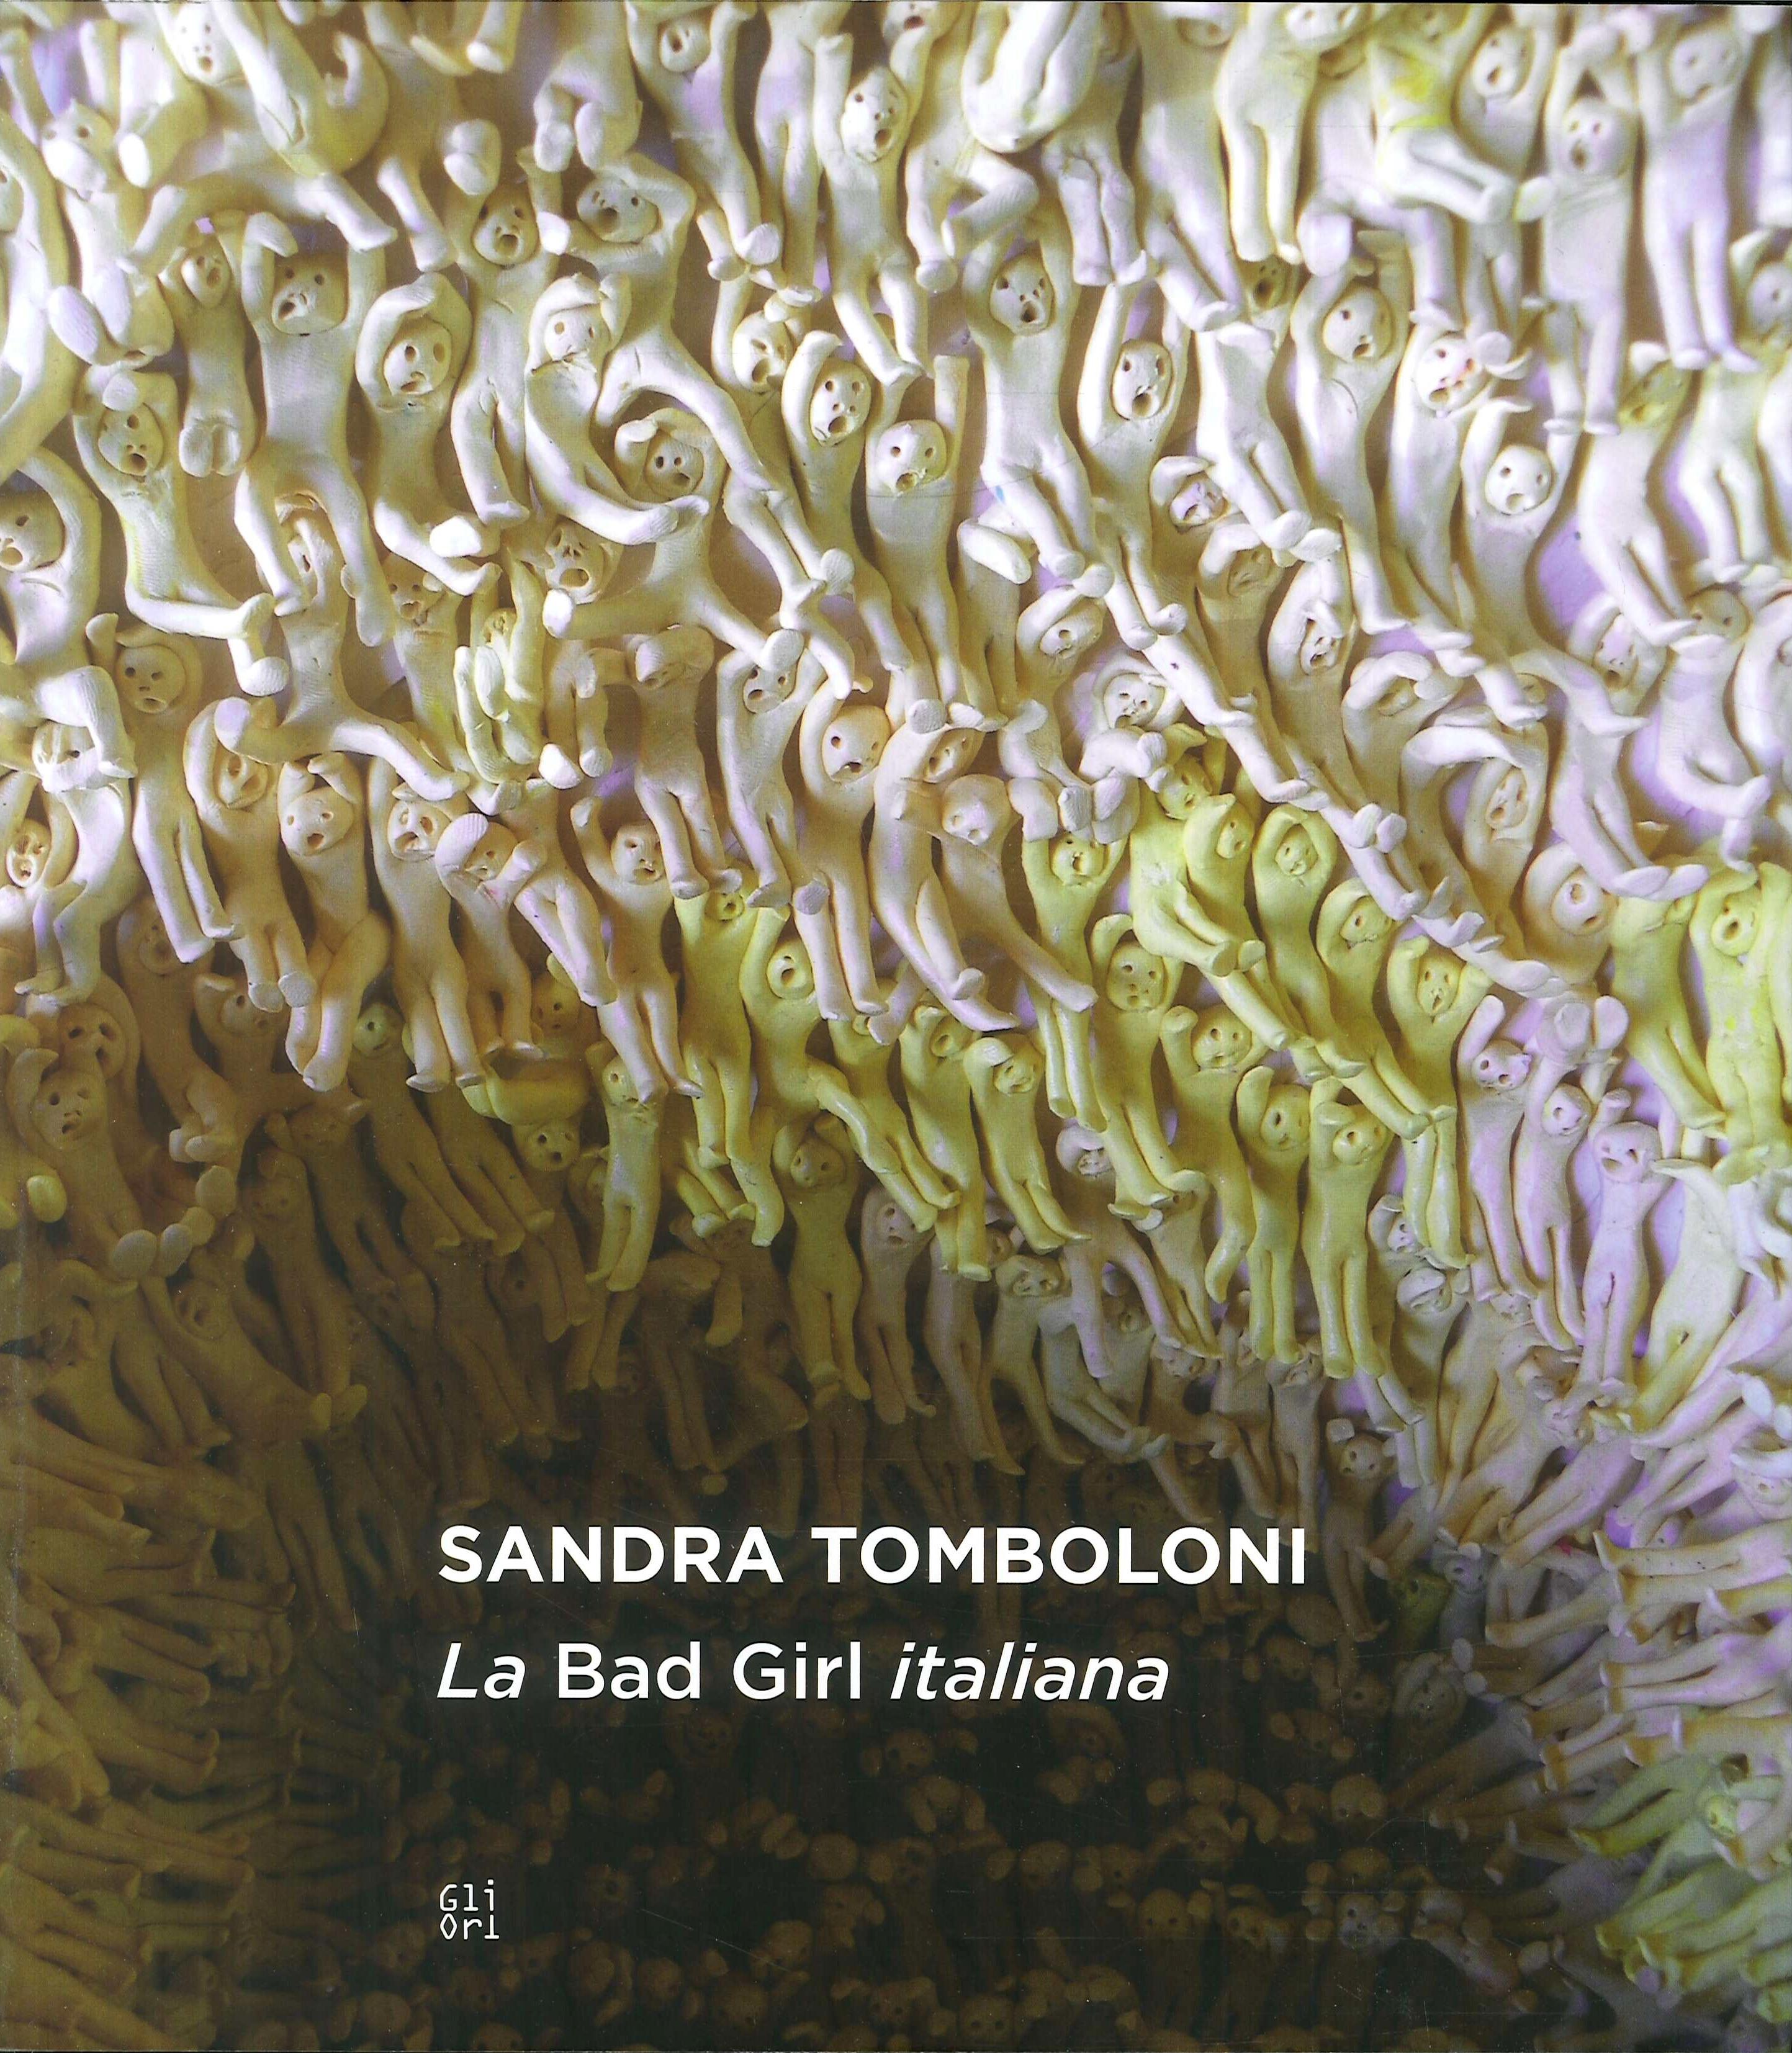 Sandra Tomboloni. La Bad Girl italiana